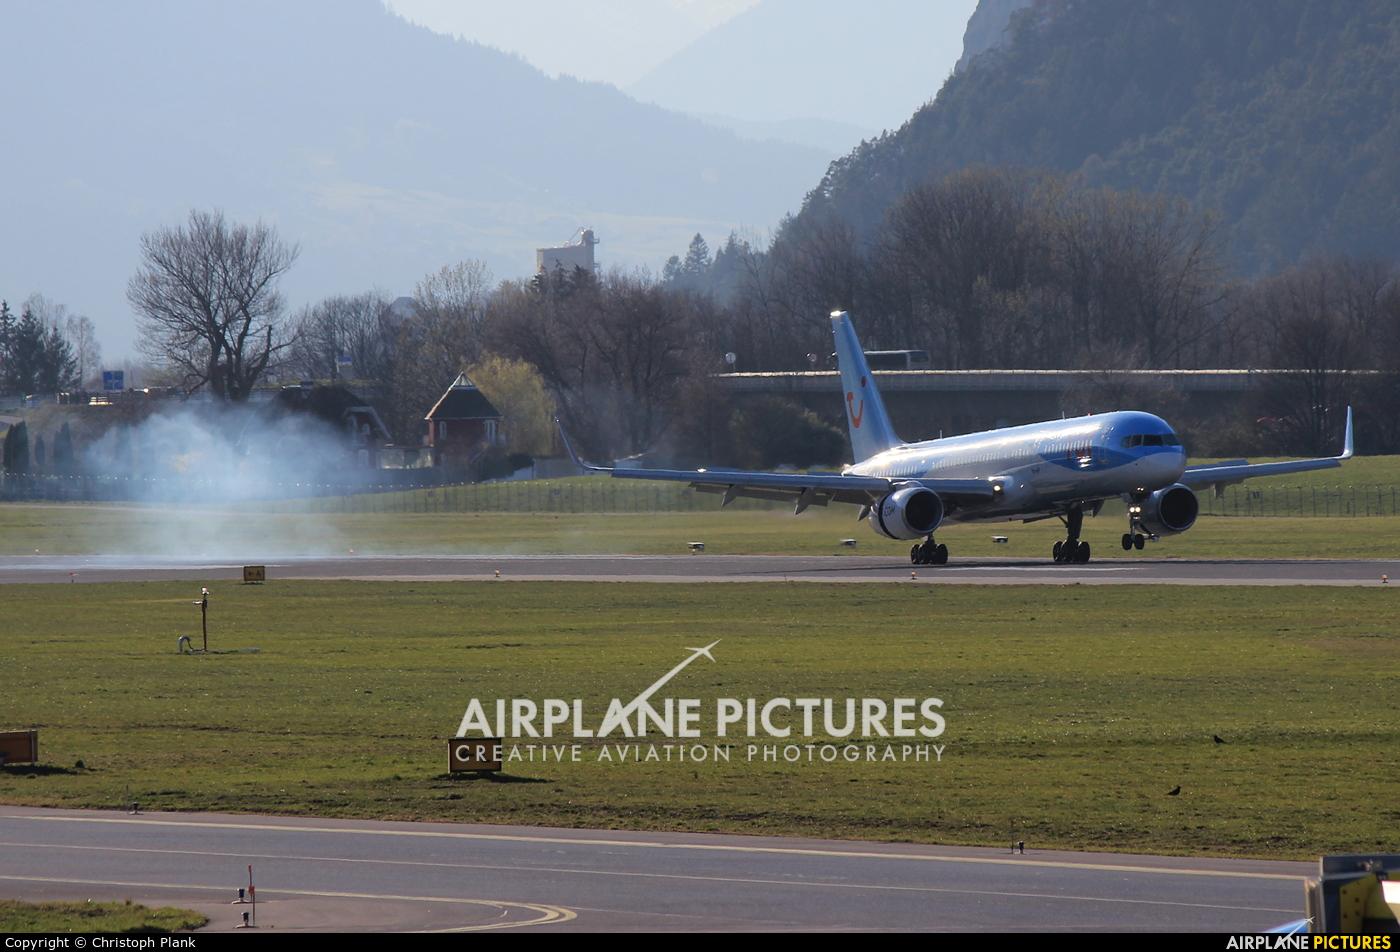 TUI Airways G-OOBF aircraft at Innsbruck